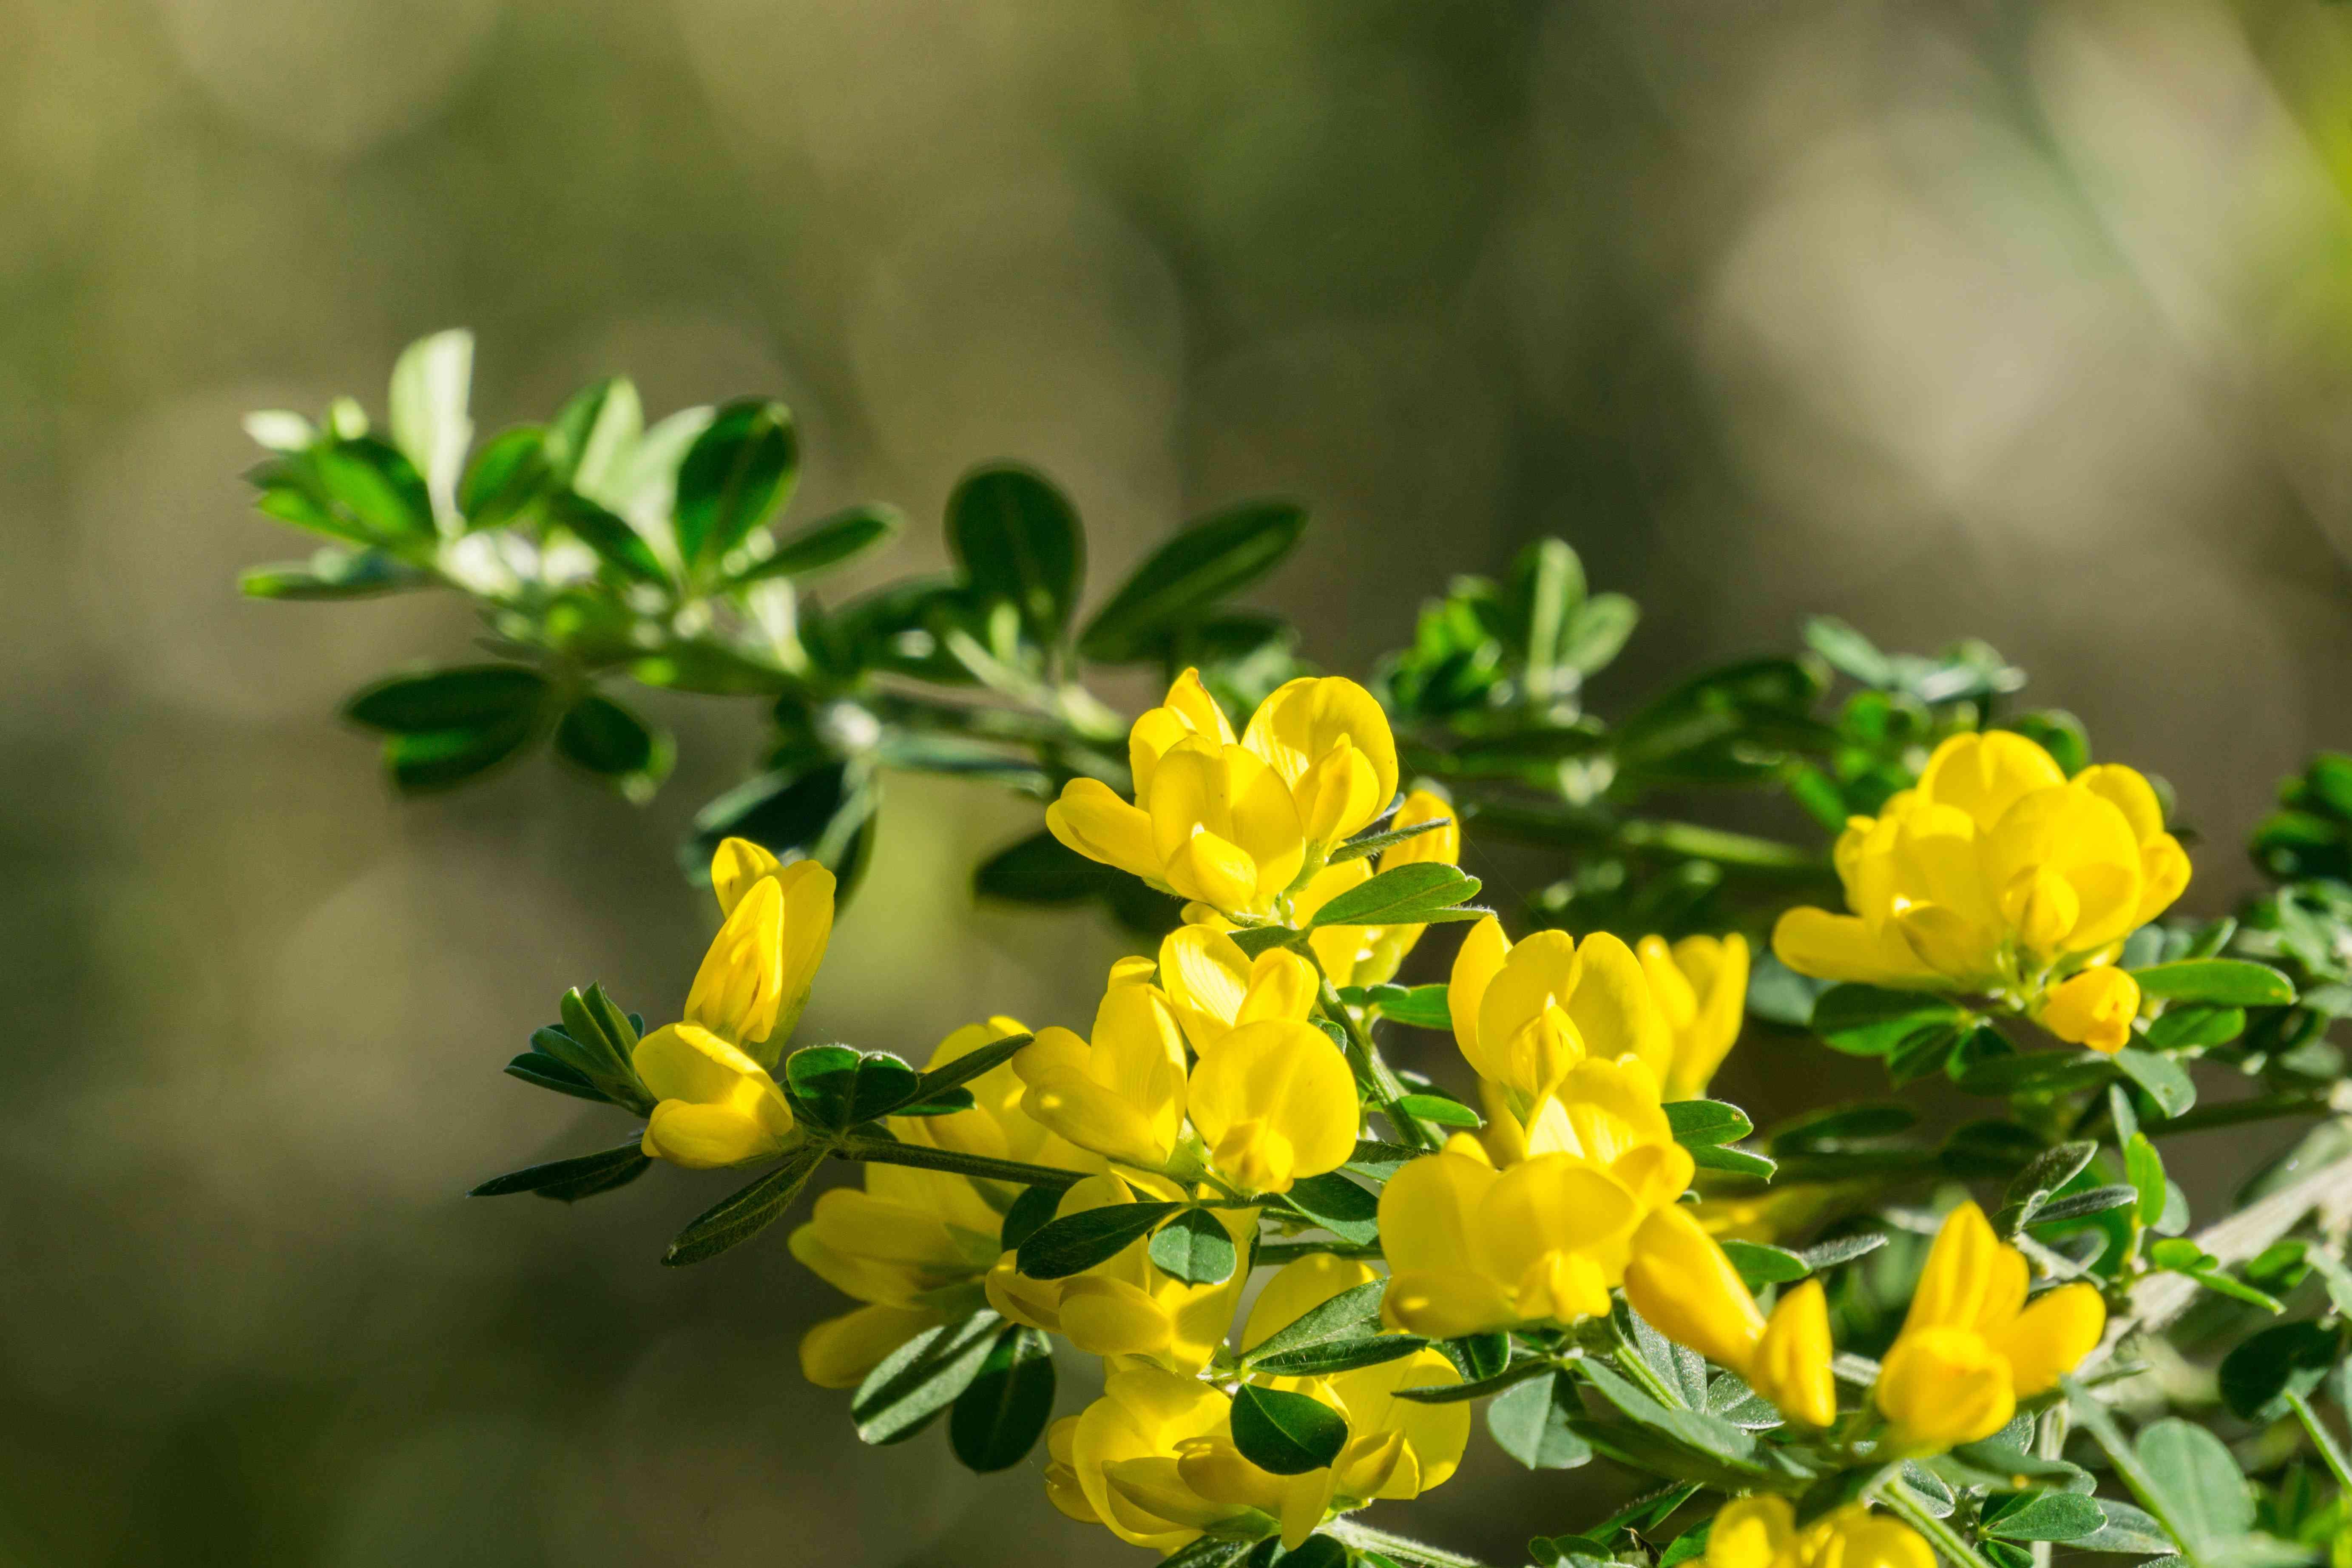 Scotch Broom; English Broom; Common Broom (Cytisus scoparius, Sarothamnus scoparius) blooming